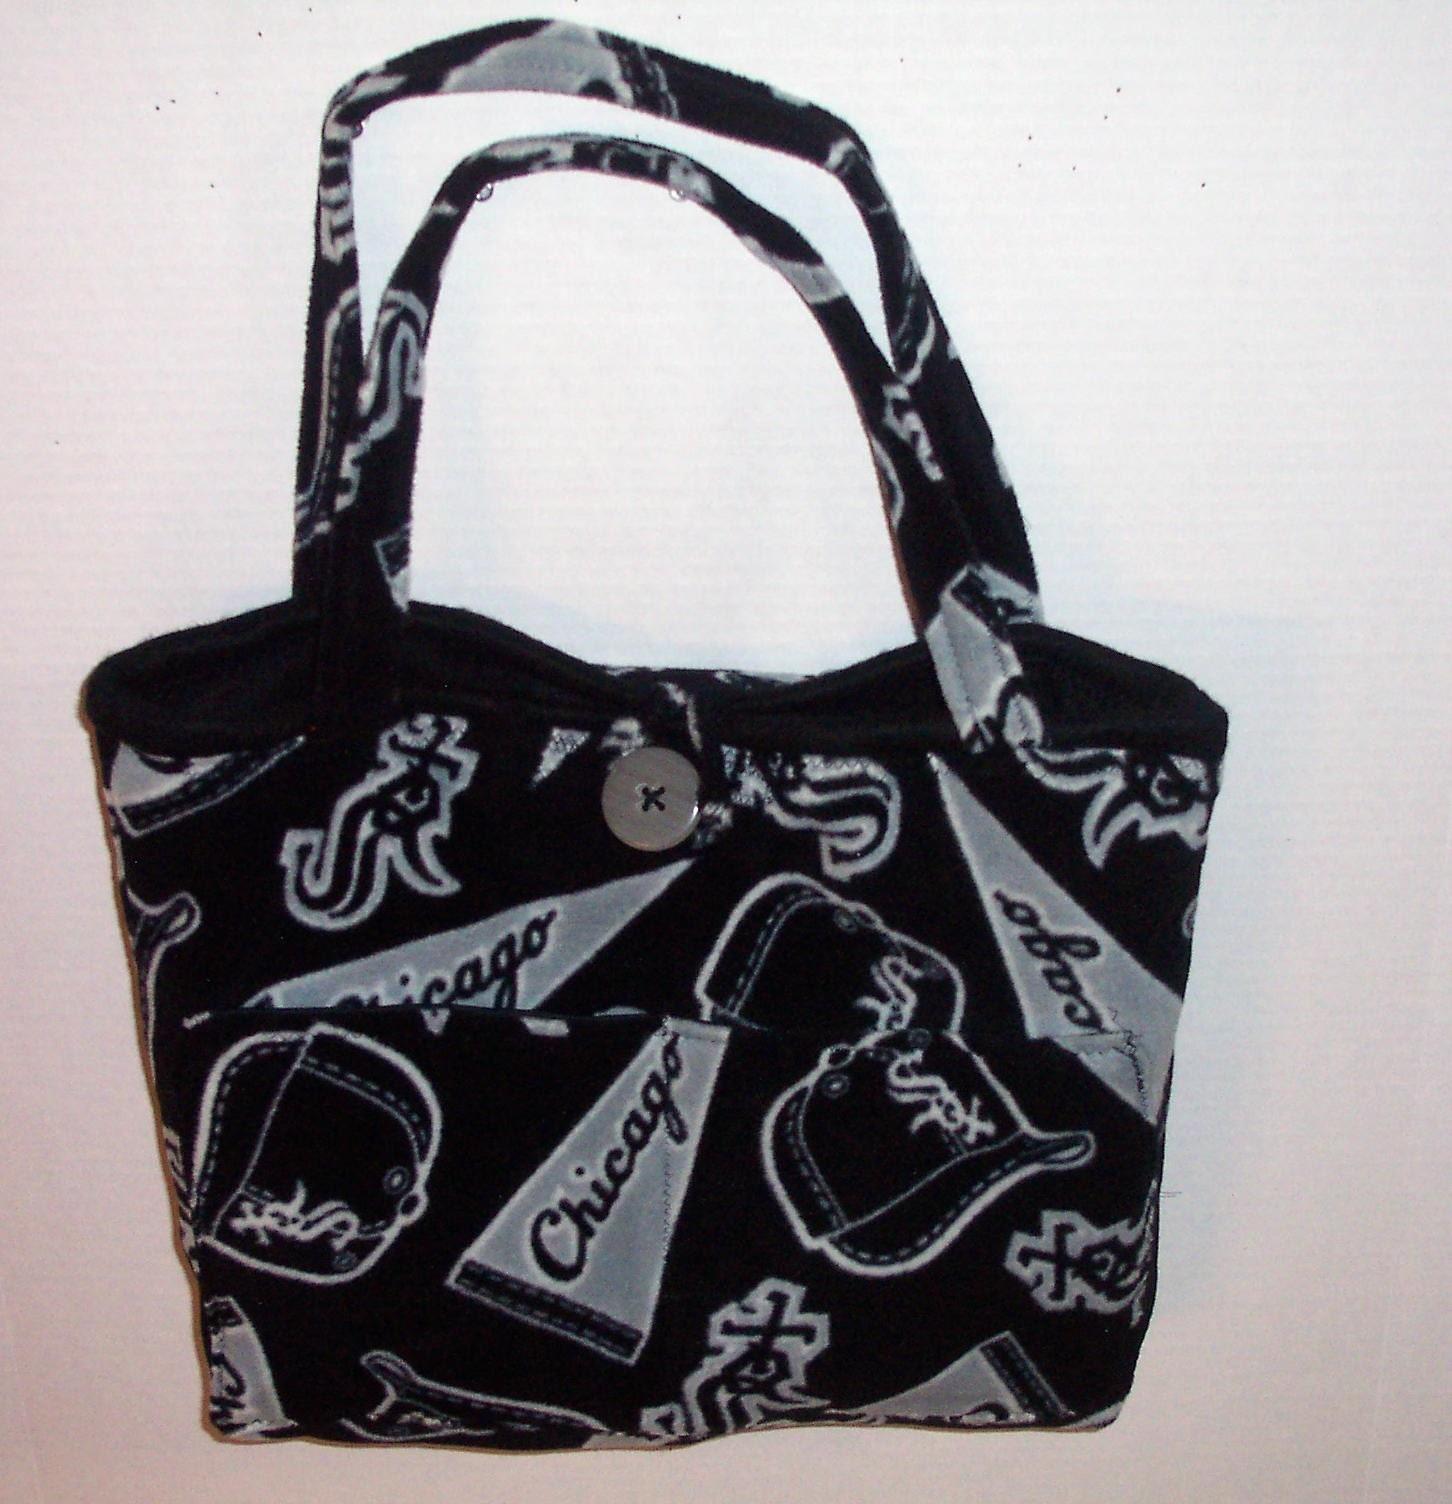 San Diego Chargers Diaper Bag: White Sox Diaper Bag